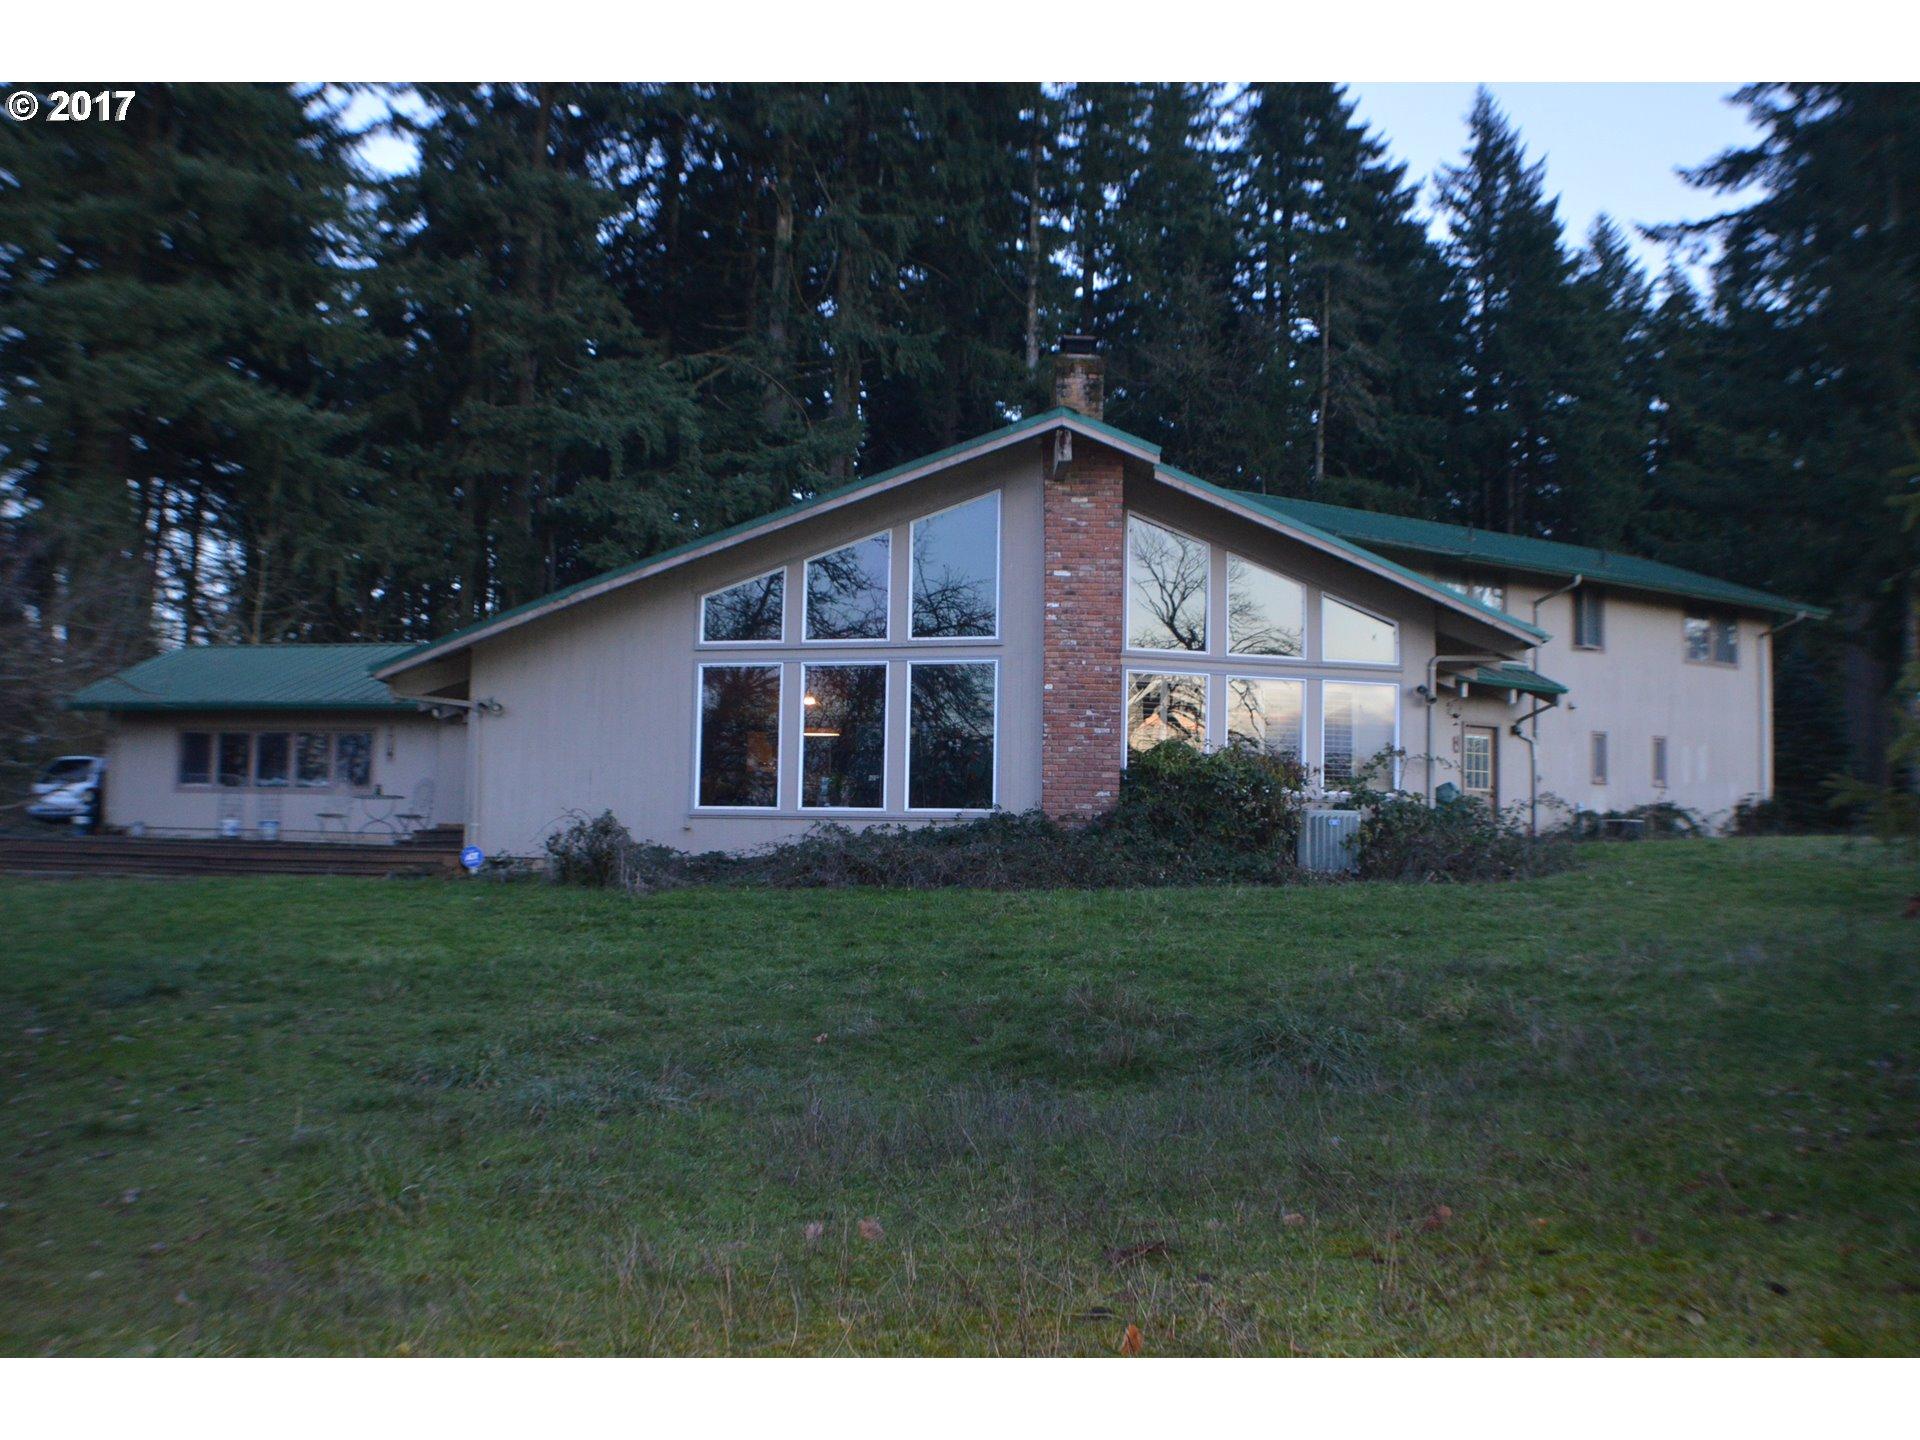 4100 GILHAM RD, Eugene, OR 97408